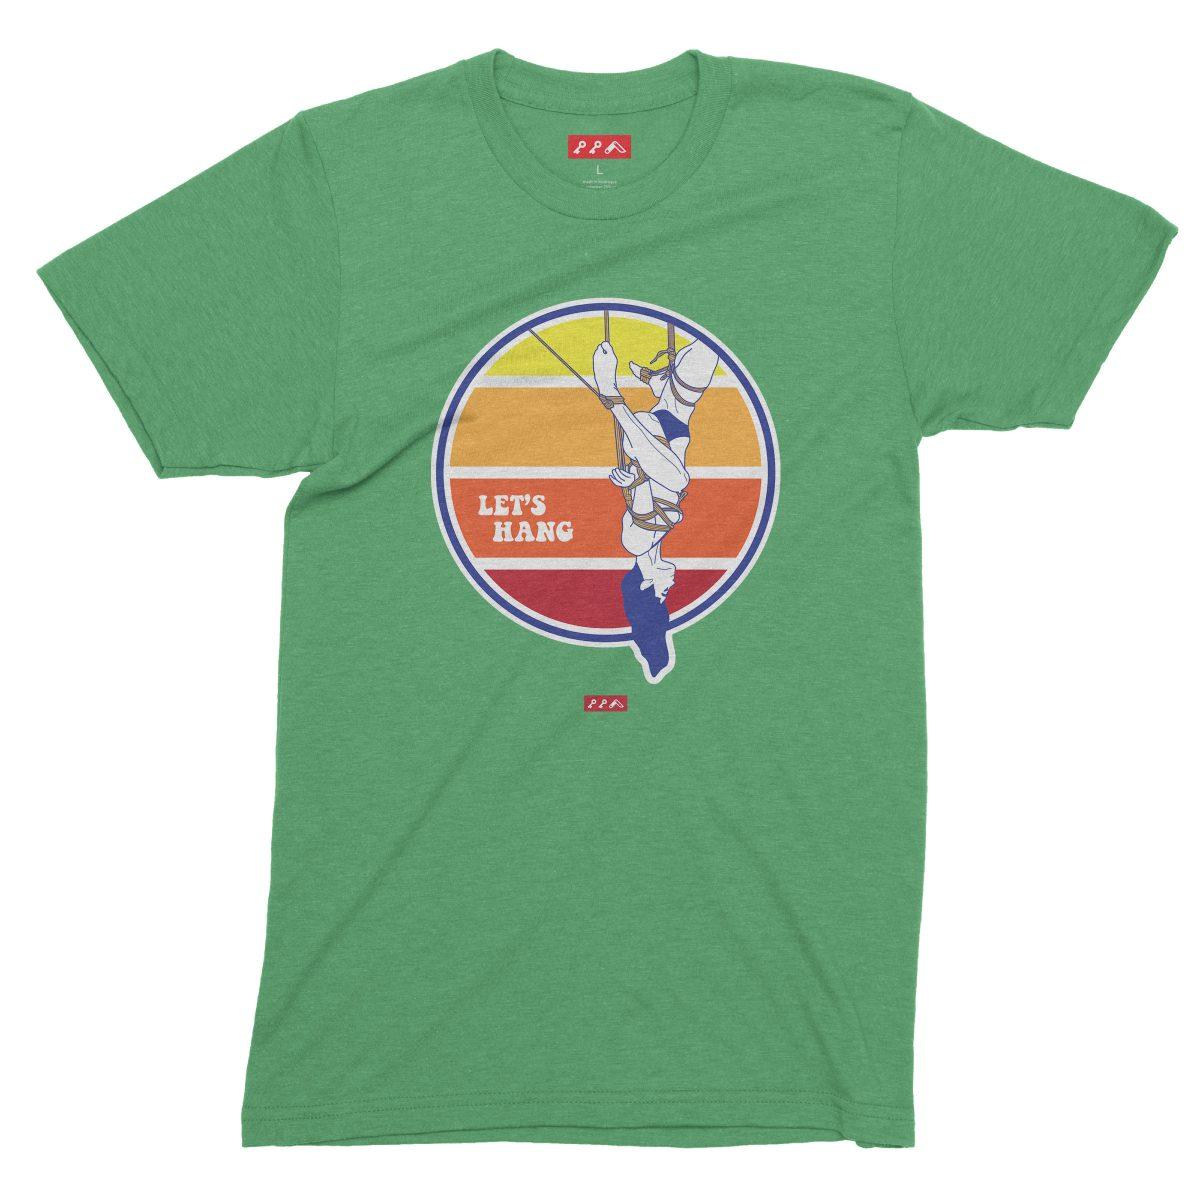 LET'S HANG shibari bondage shirt in green tri-blend